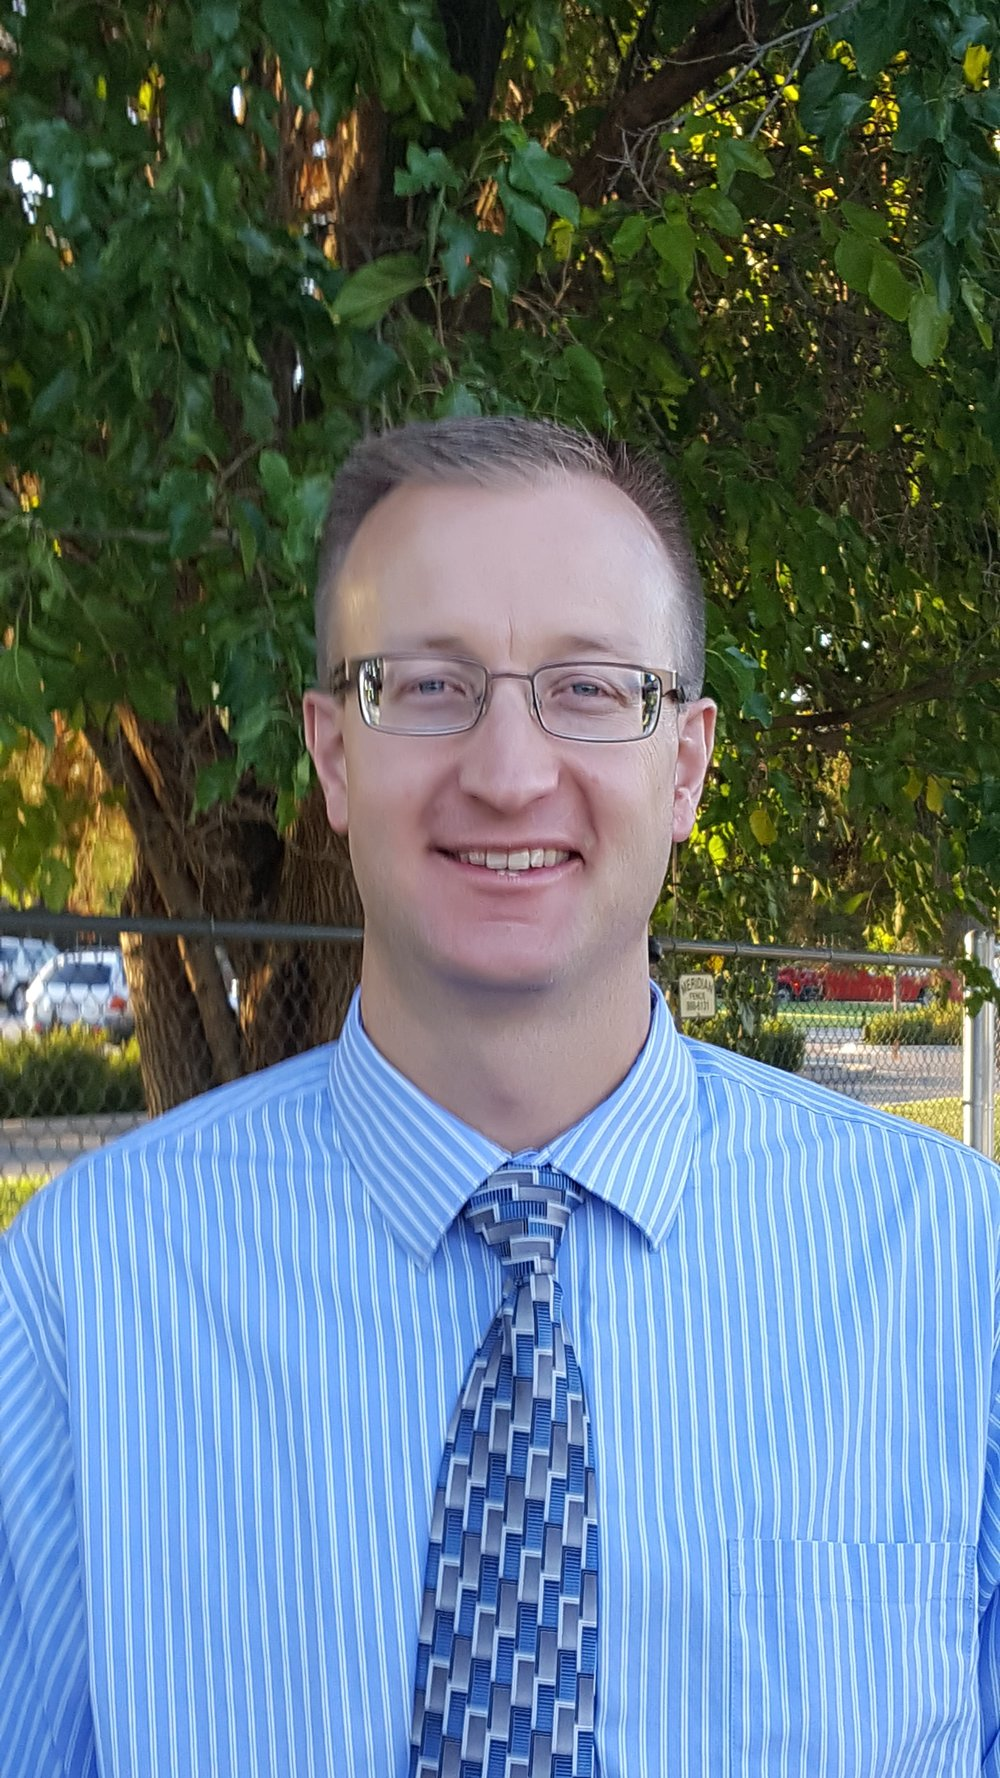 Rodney Bates, DO Primary Care Chair.           Tel: (208) 810-7809 rbates@idahocom.org